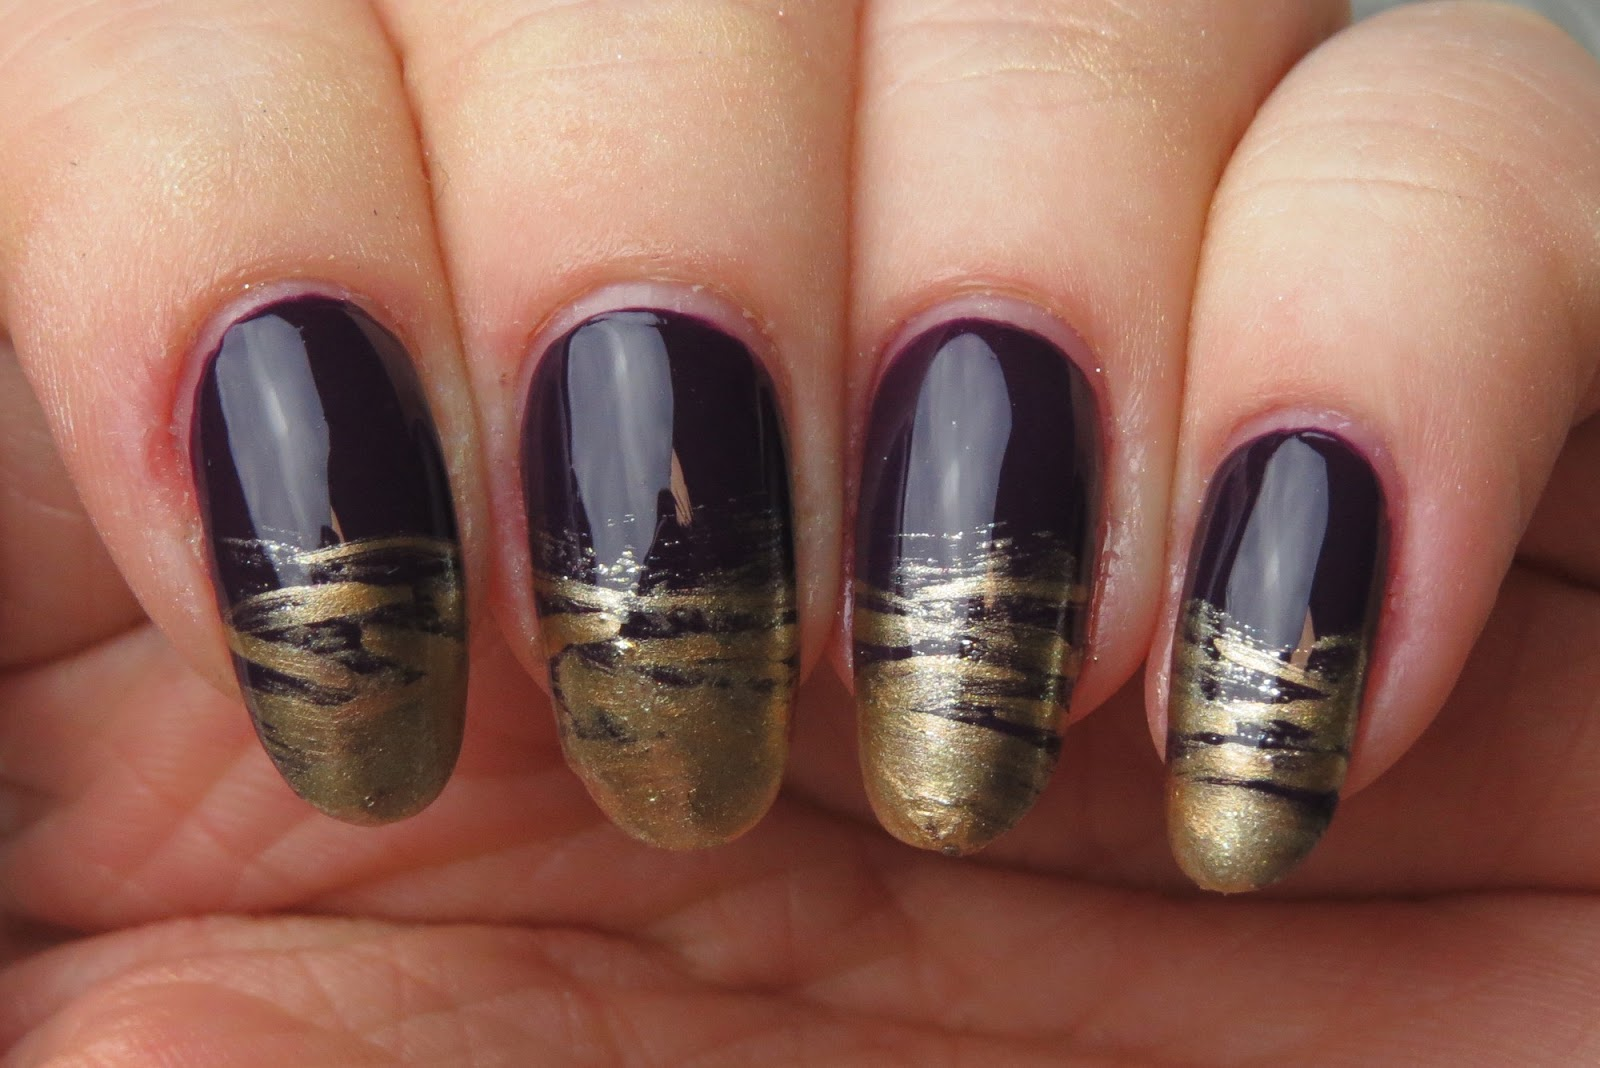 Mani monday brushed tips kaitlyn elisabeth beauty brushstroke nail art design french tip nail art design metallic nail polish prinsesfo Images